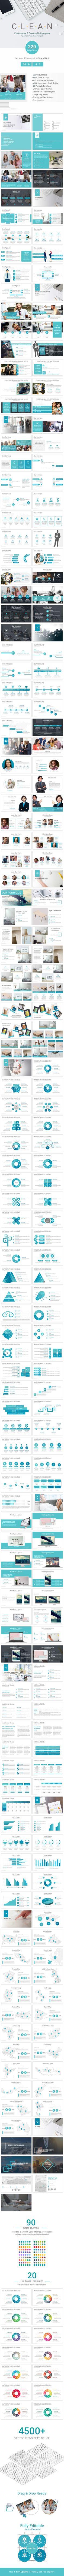 ultimate - 2015 presentation pack template download: http, Presentation Pack Template, Presentation templates